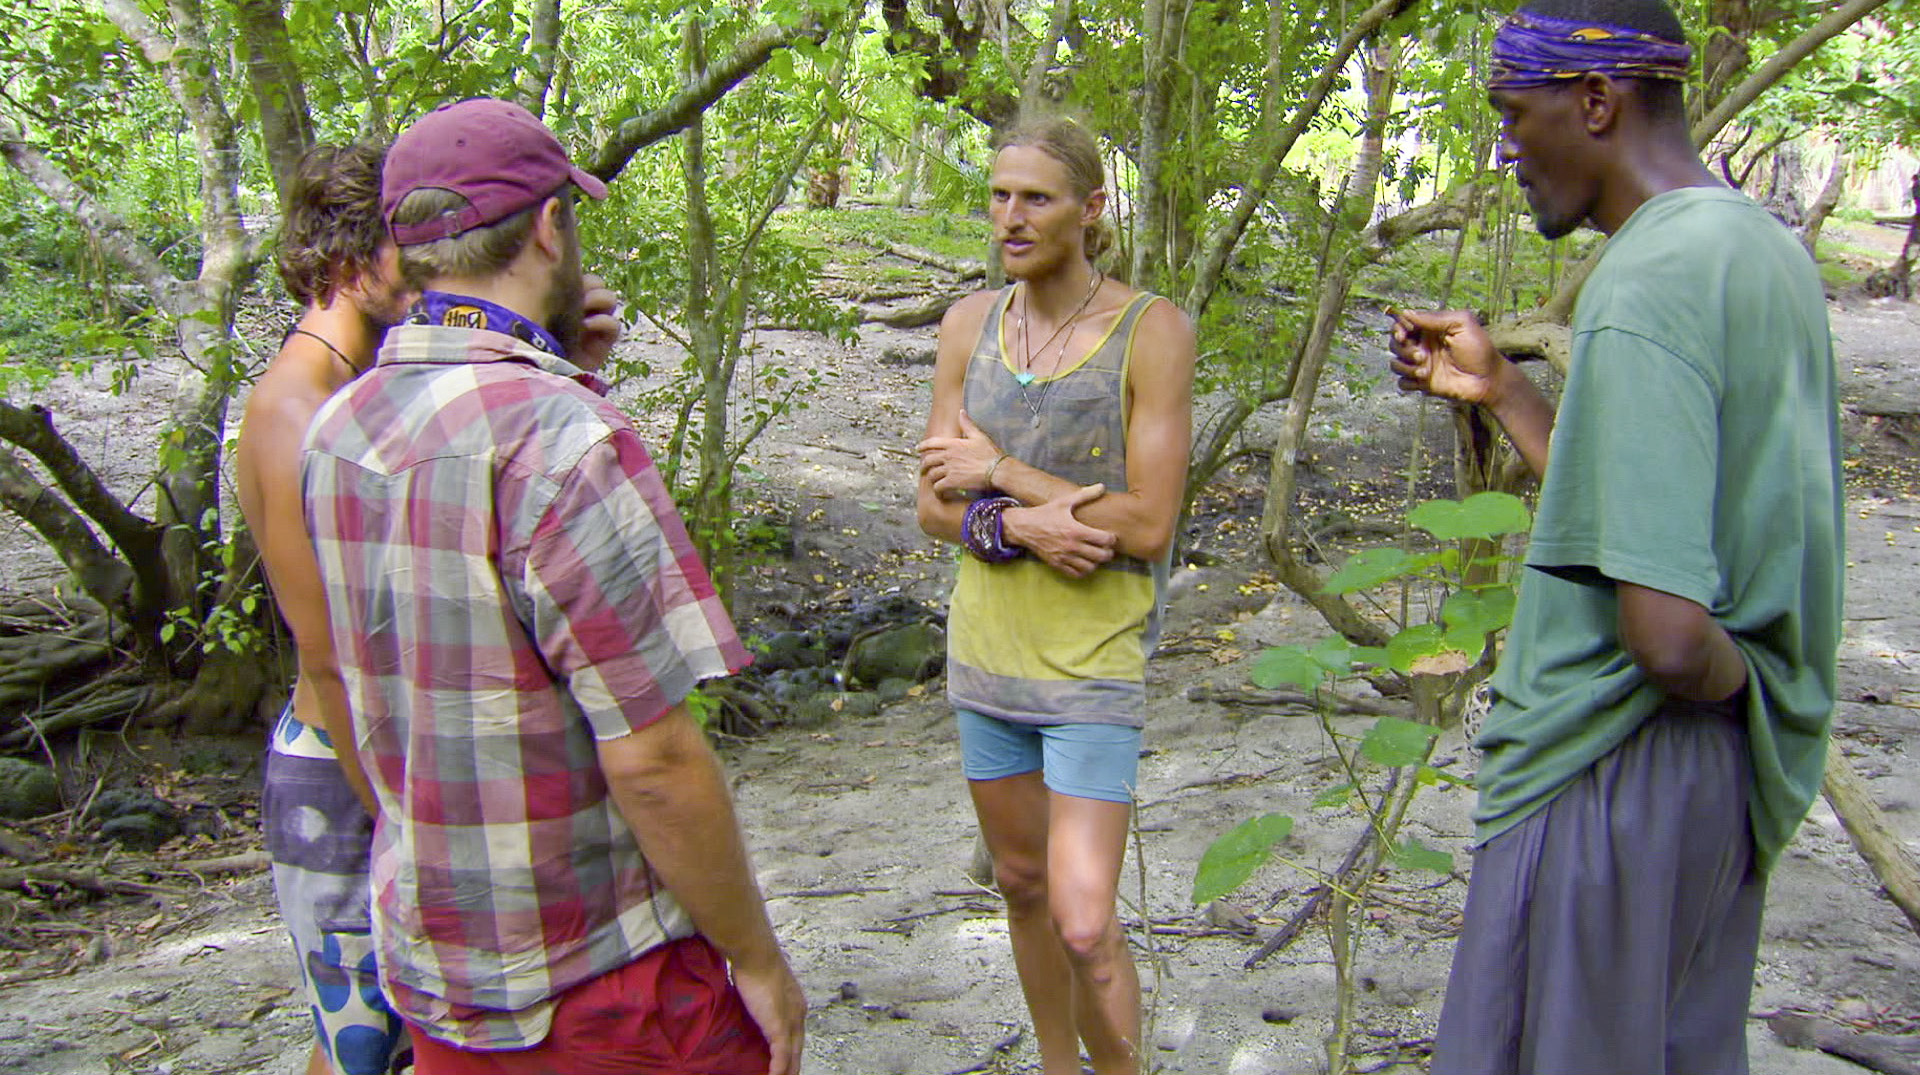 Hyaden, Caleb, Tyson and Gervase in Season 27 Episode 11